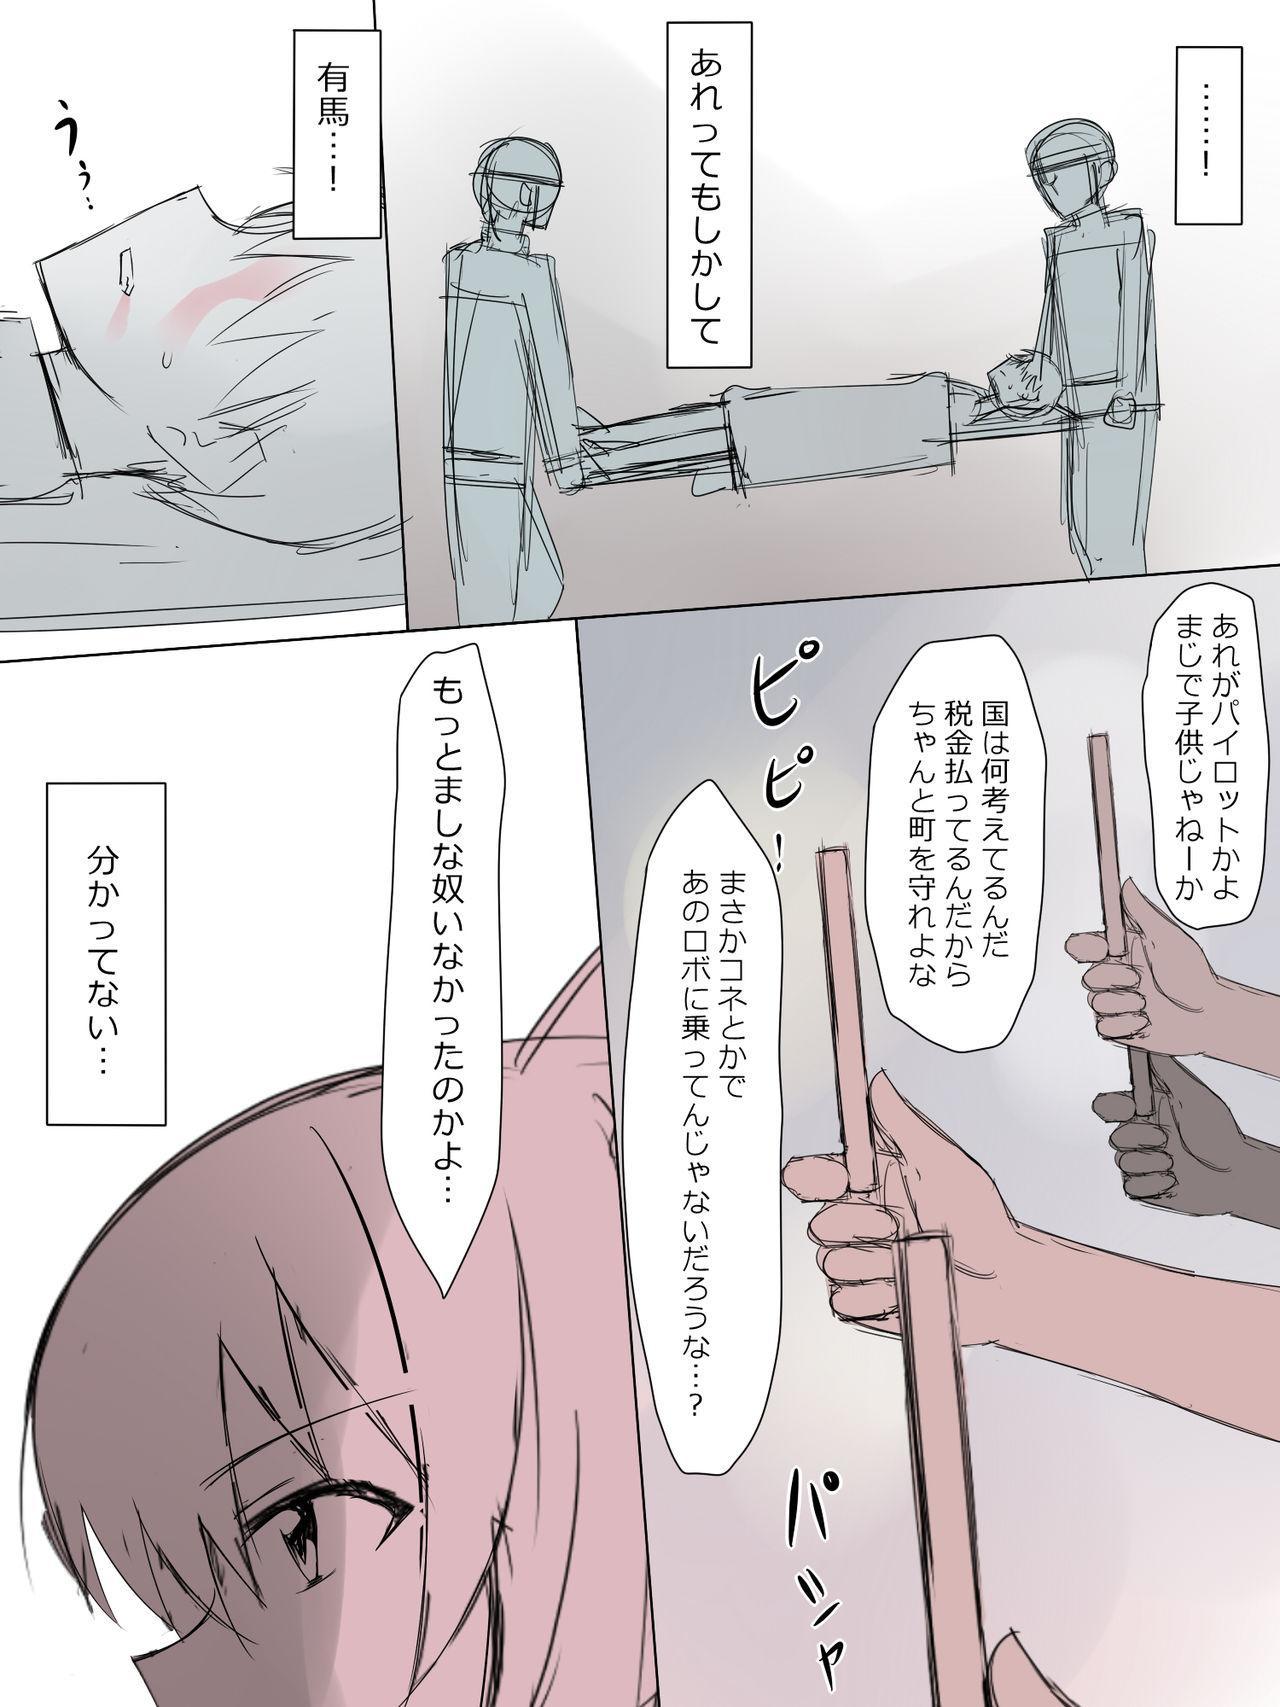 [Kagemusha] Arima-kun to 40-nin no Classmate 22